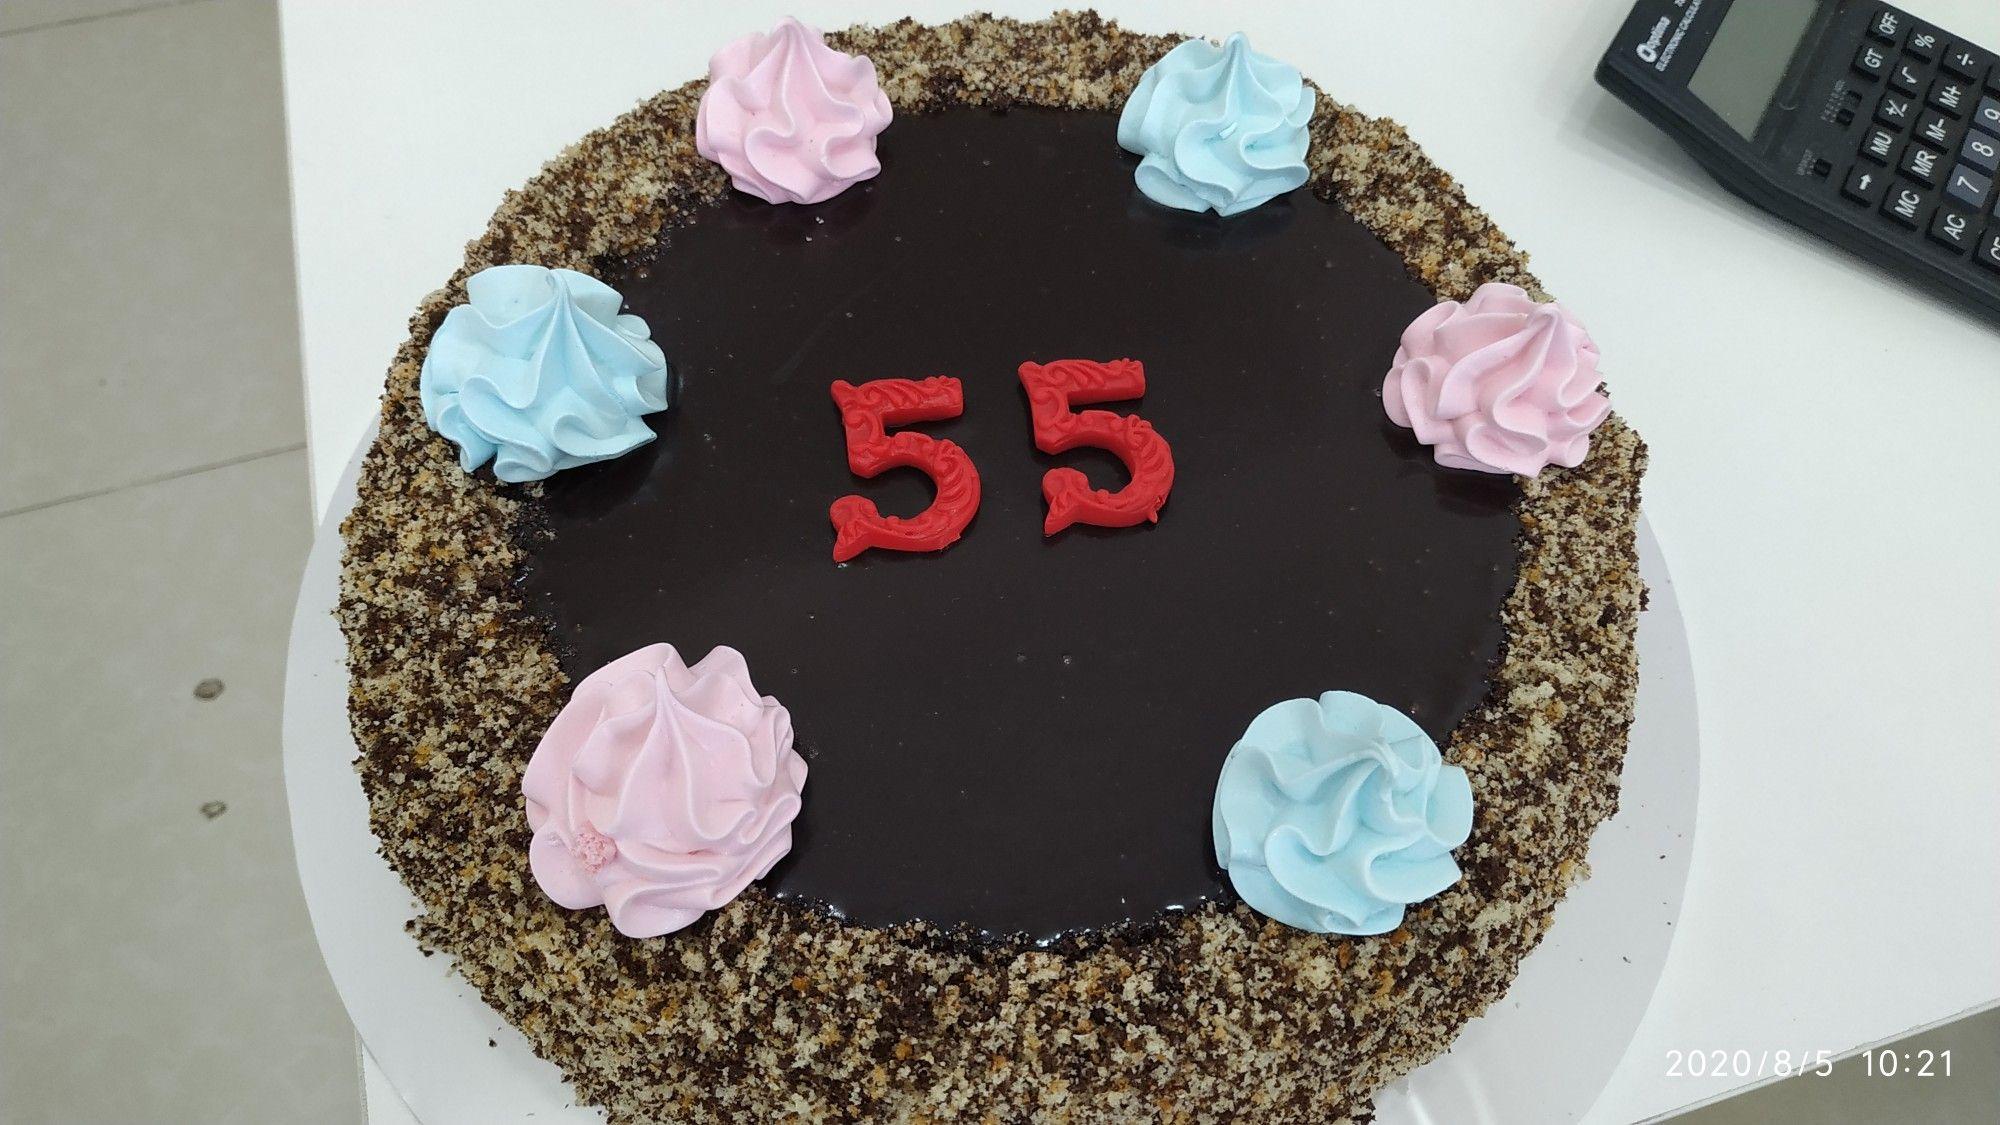 Dogum Gunu 55 Yas Desserts Birthday Cake